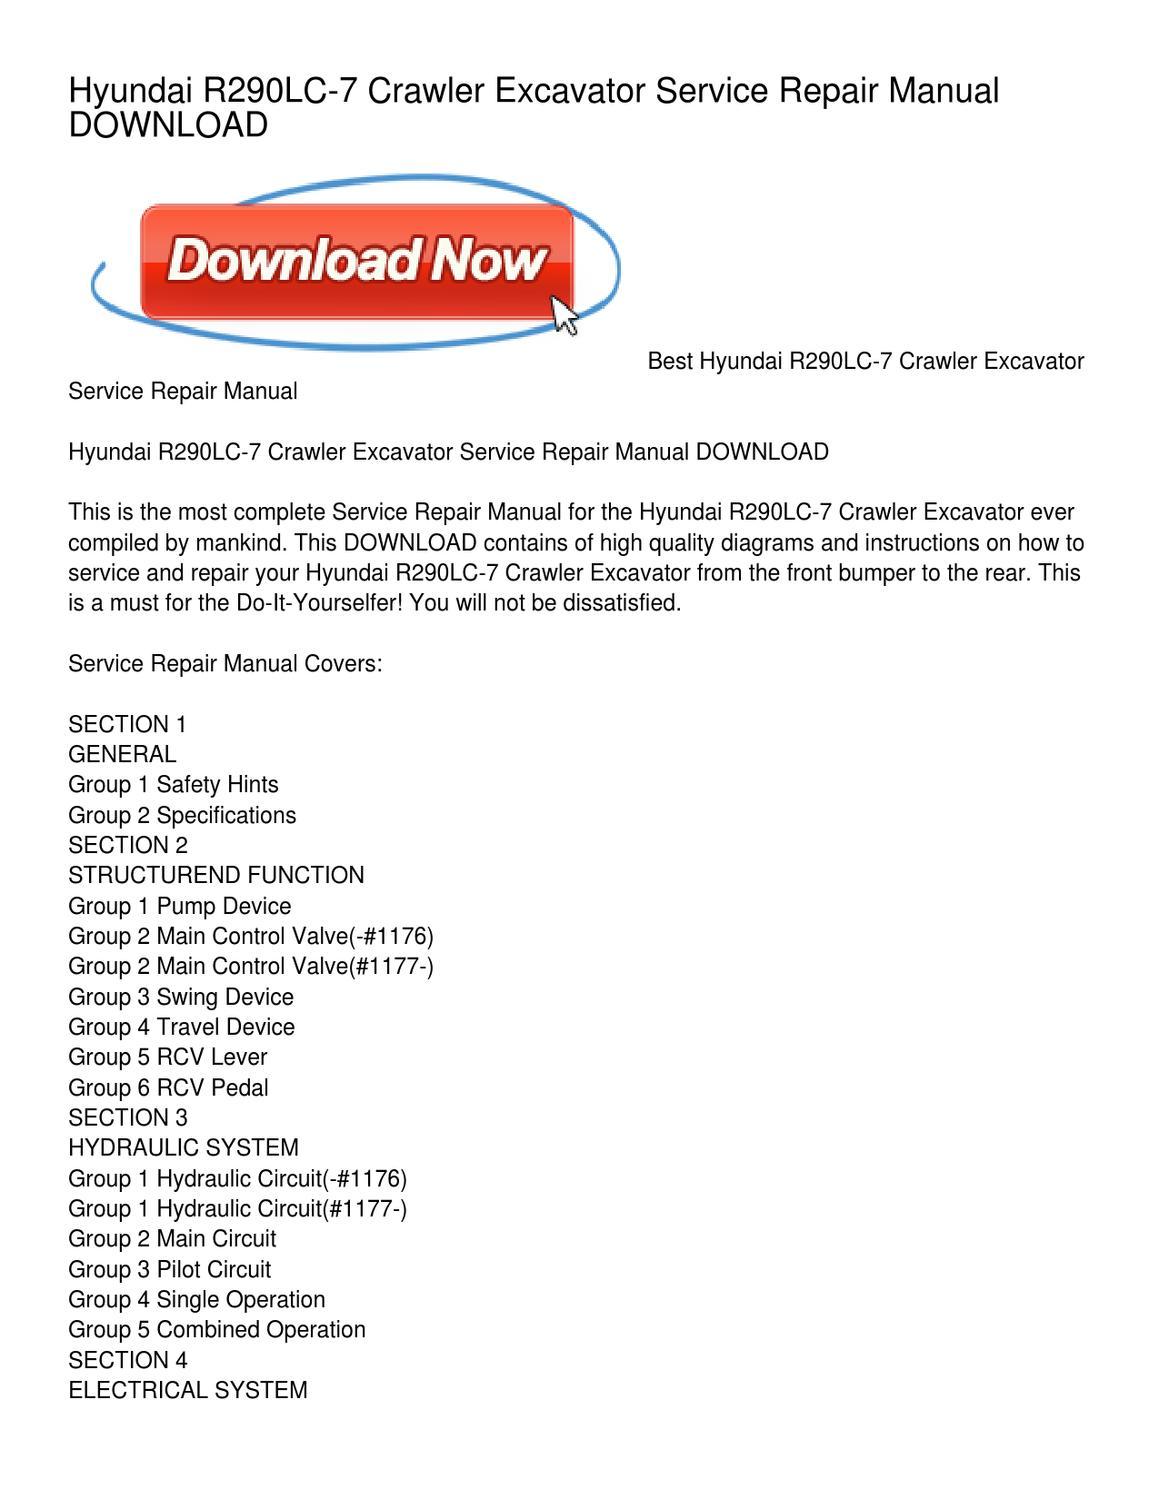 Hyundai R290LC-7 Crawler Excavator Service Repair Manual DOWNLOAD by Henry  Gray - issuu